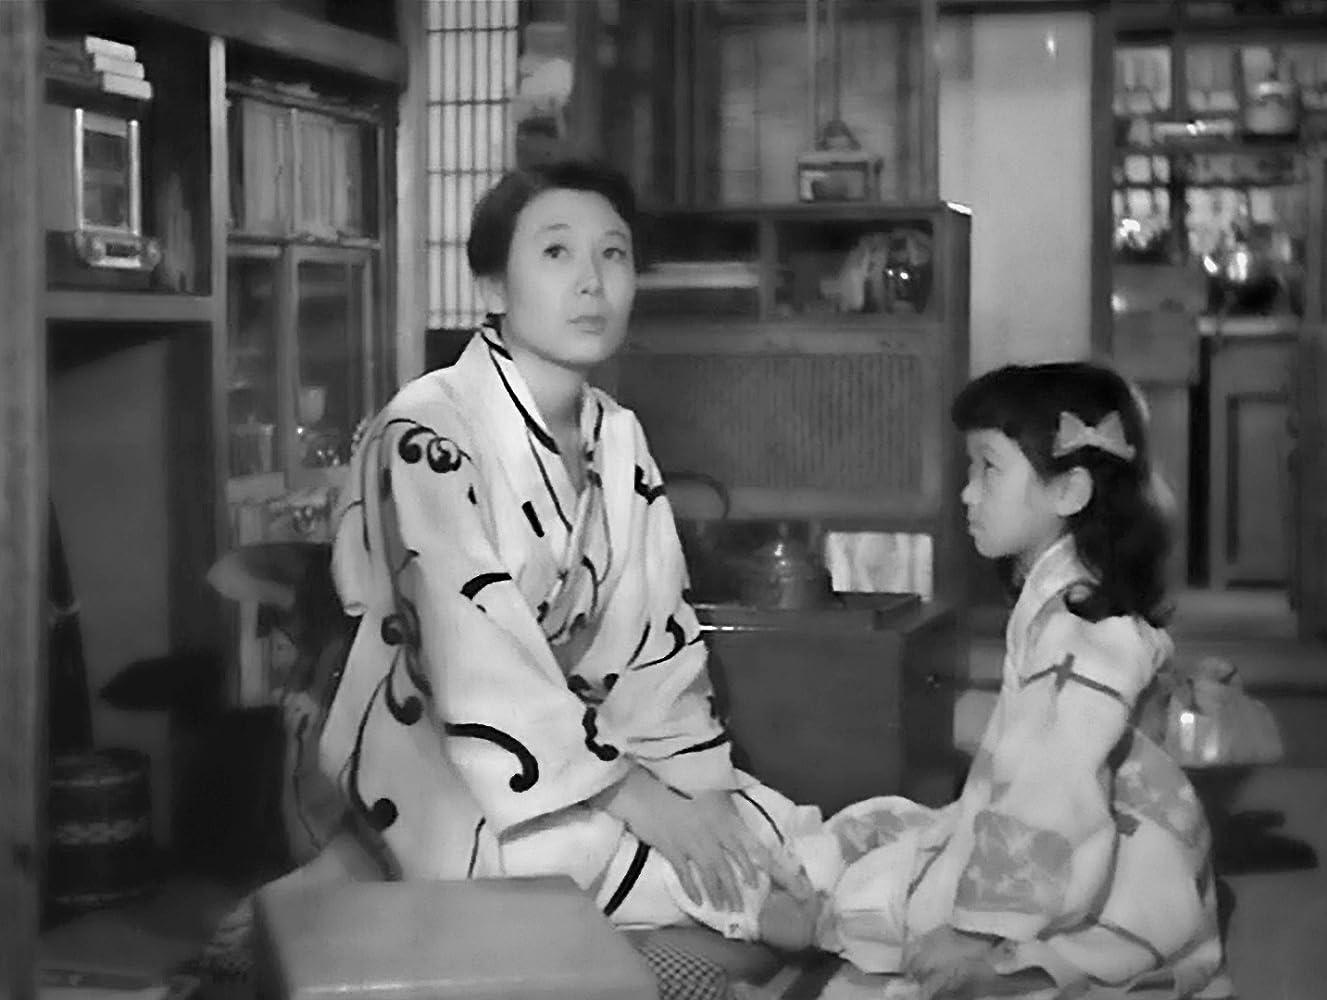 Forum on this topic: Leslie Winston, sumiko-kurishima/